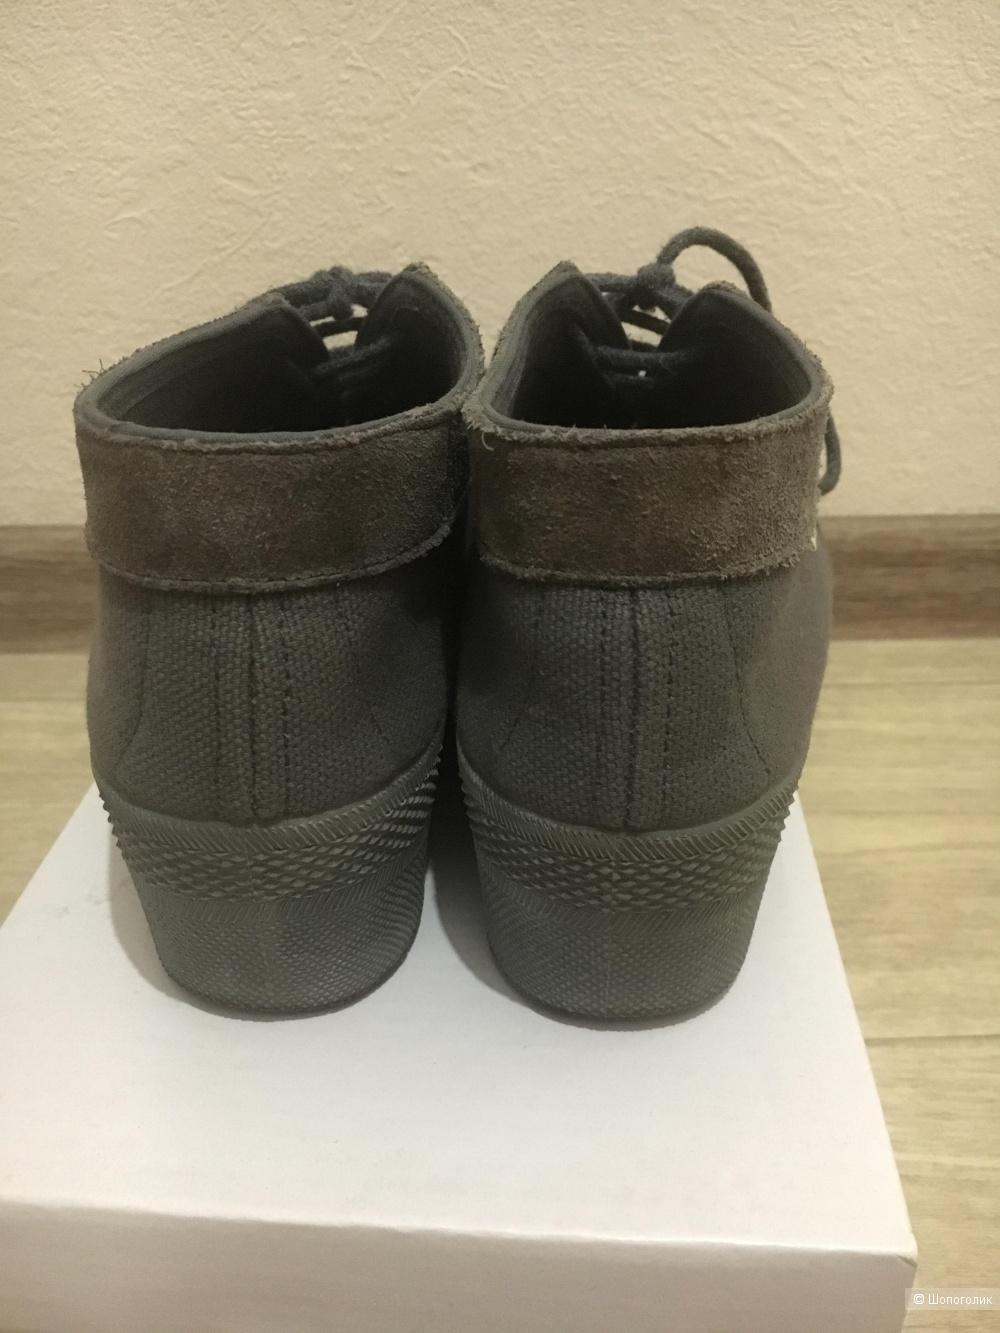 Кеды-полуботинки Maians 36,5 - 37 размер